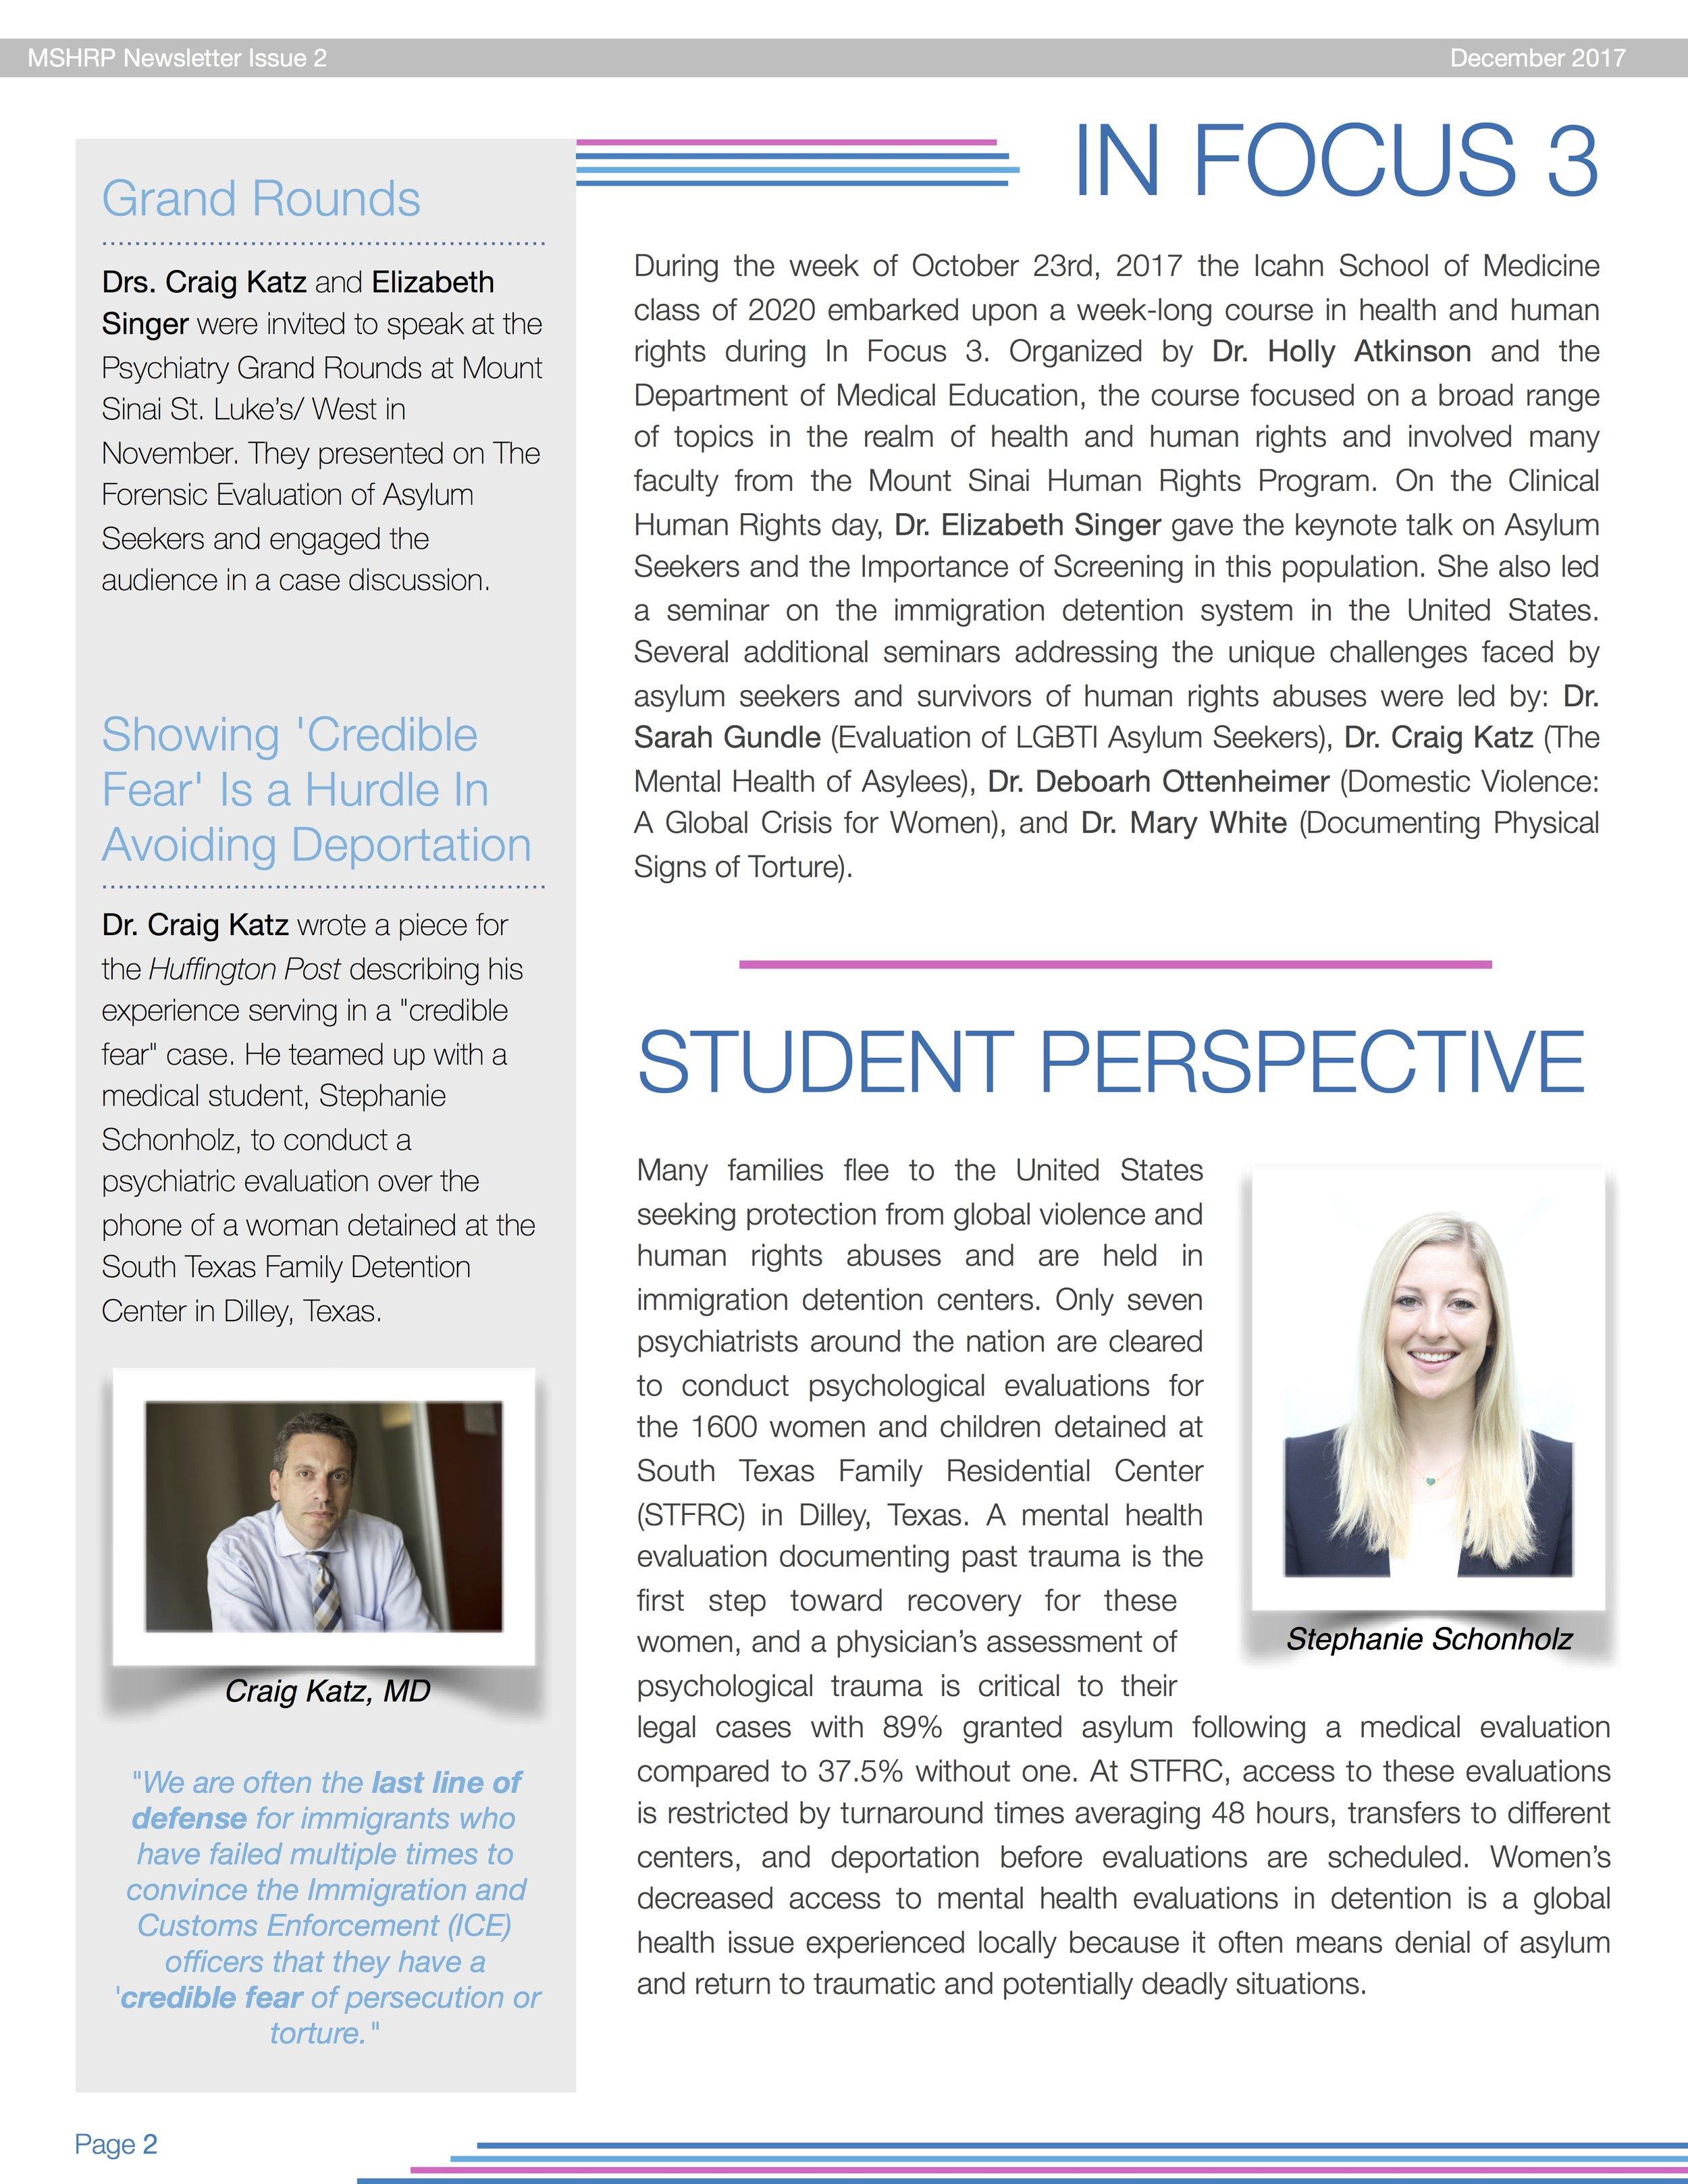 MSHRP Newsletter Issue 2 121017 (dragged) 1.jpg